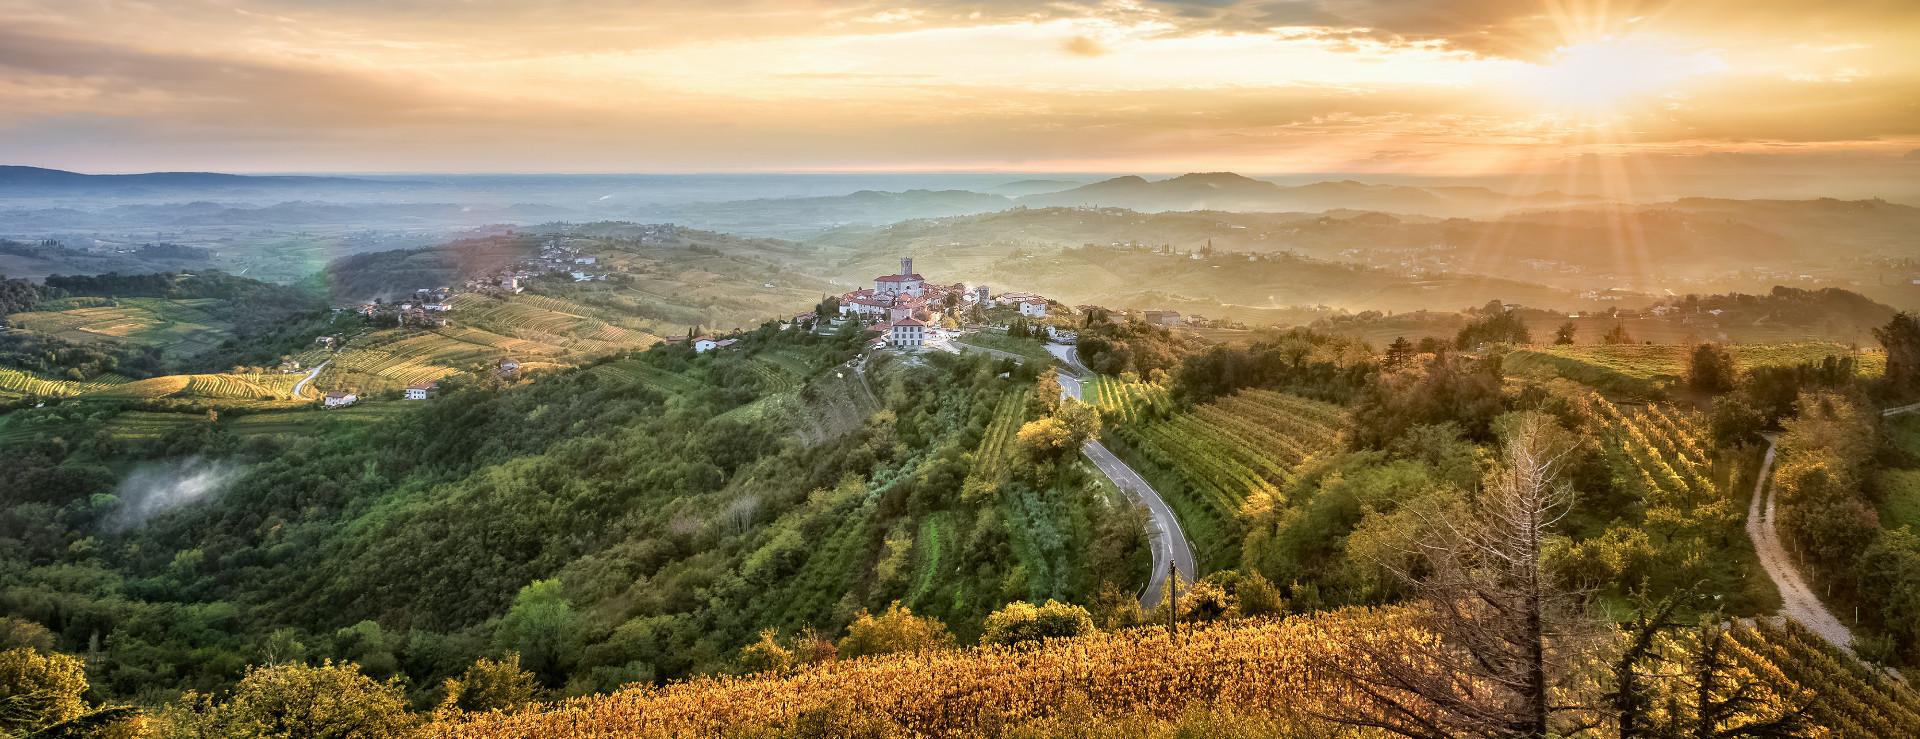 Brda panorama wijnregio slovenië